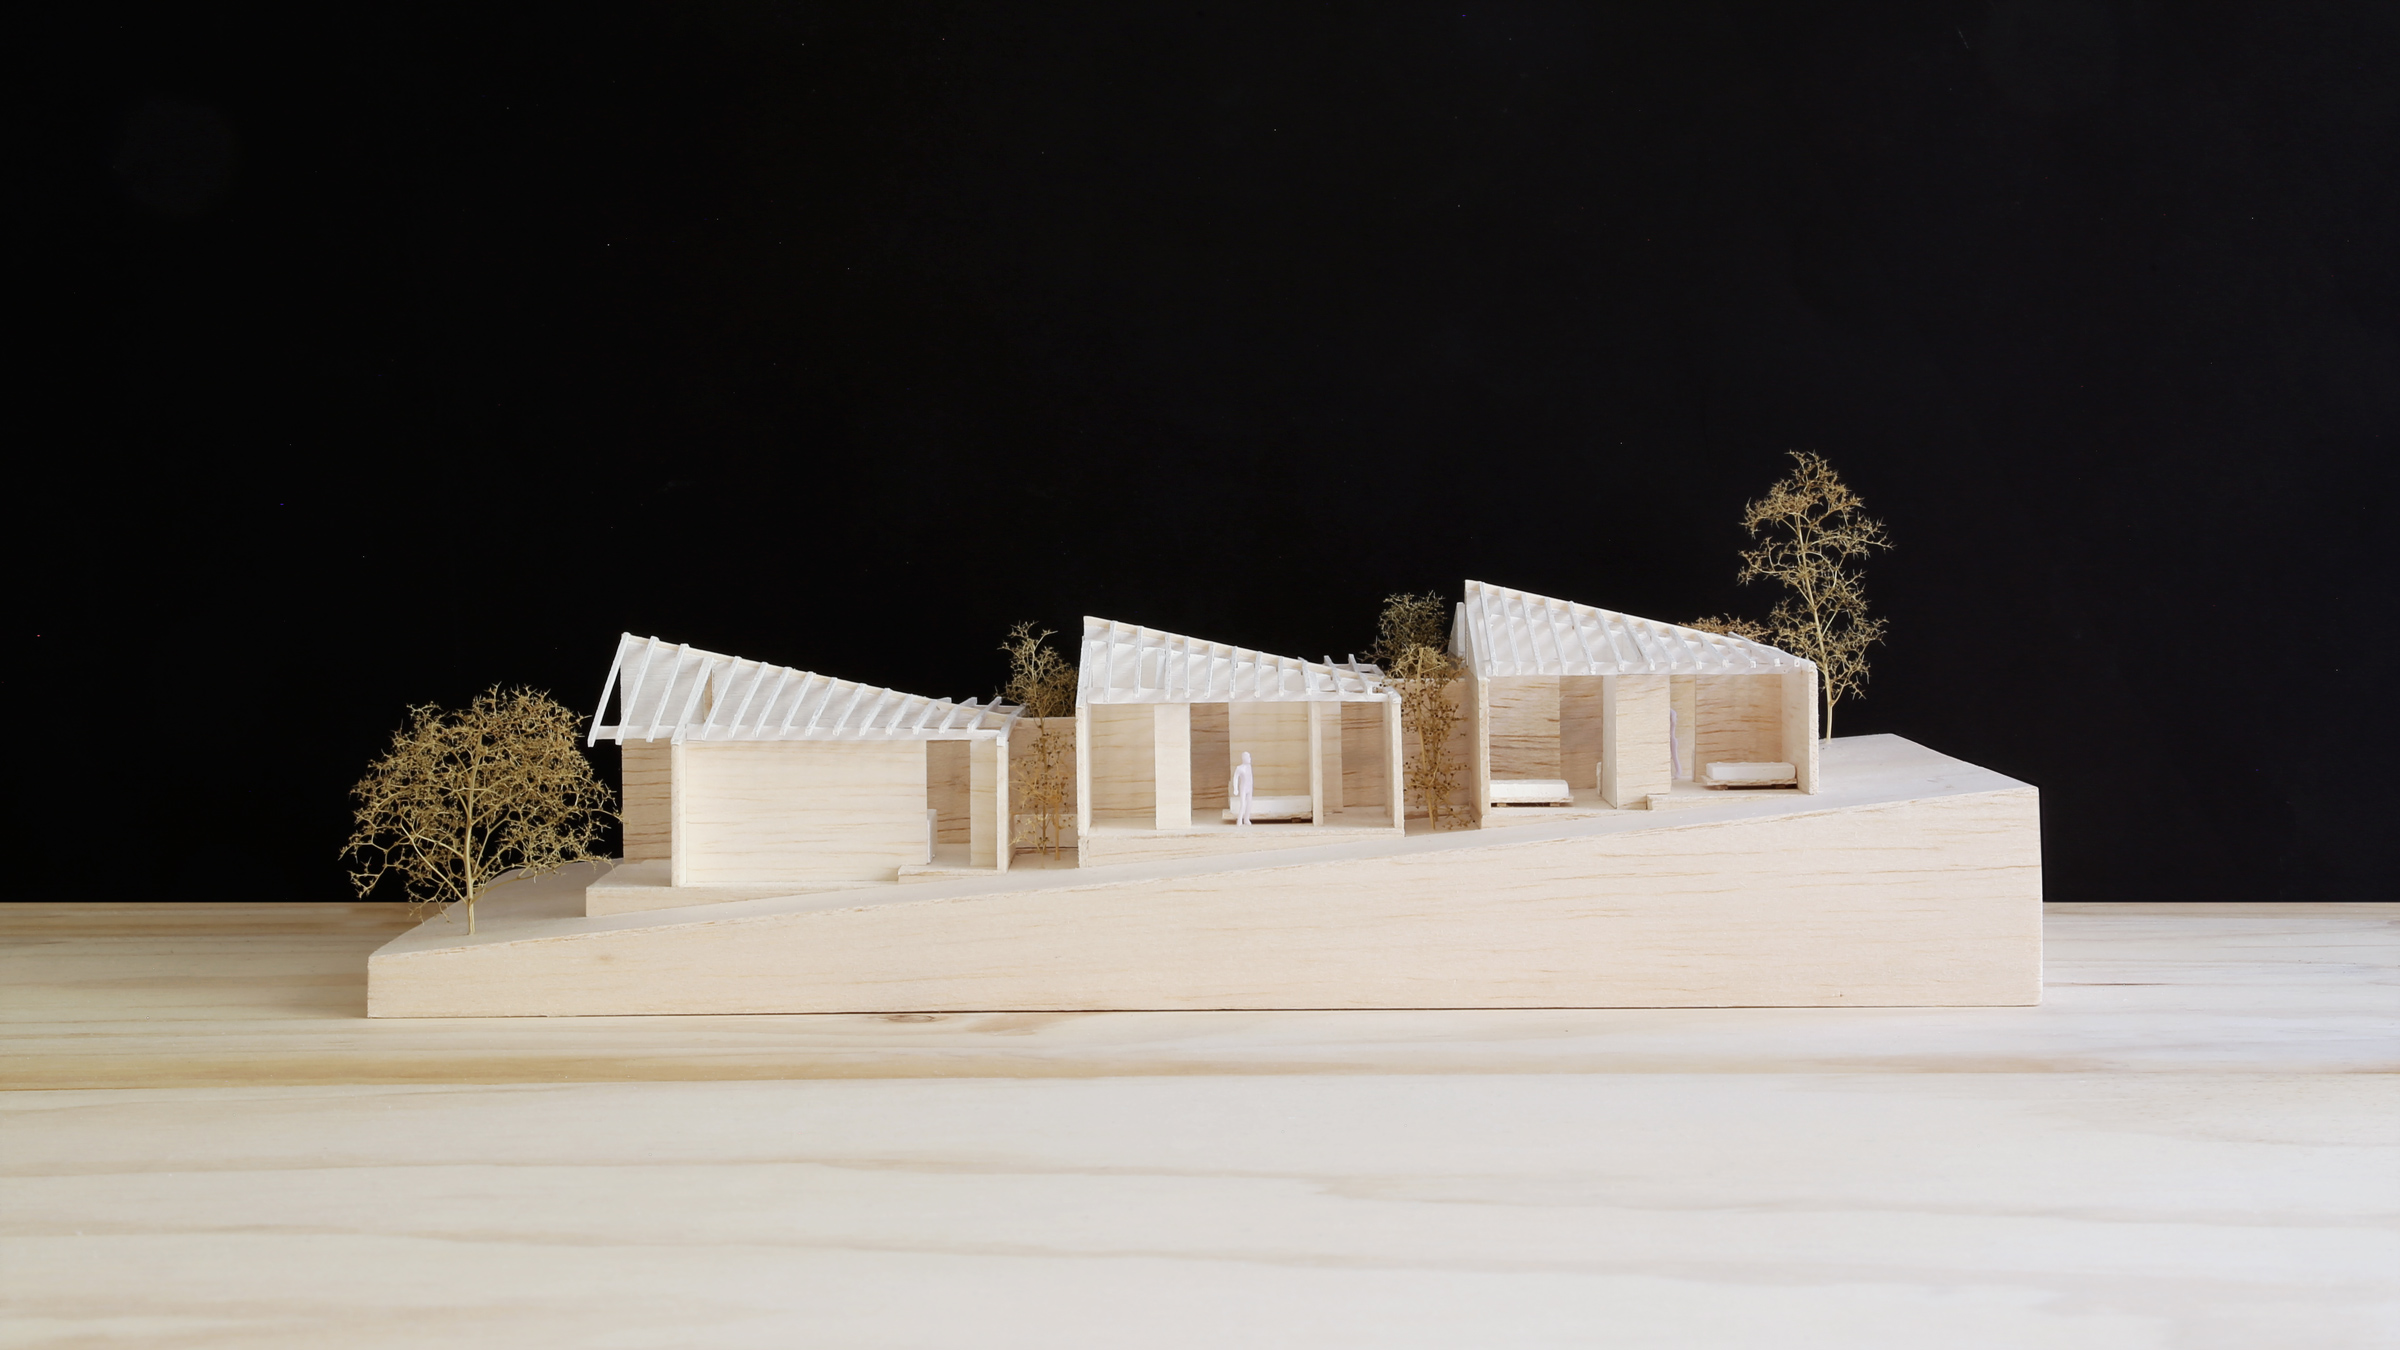 SYDNEY-RESIDENTIAL-ARCHITECT-TRIAS-STUDIO-HALF A HOUSE-M03